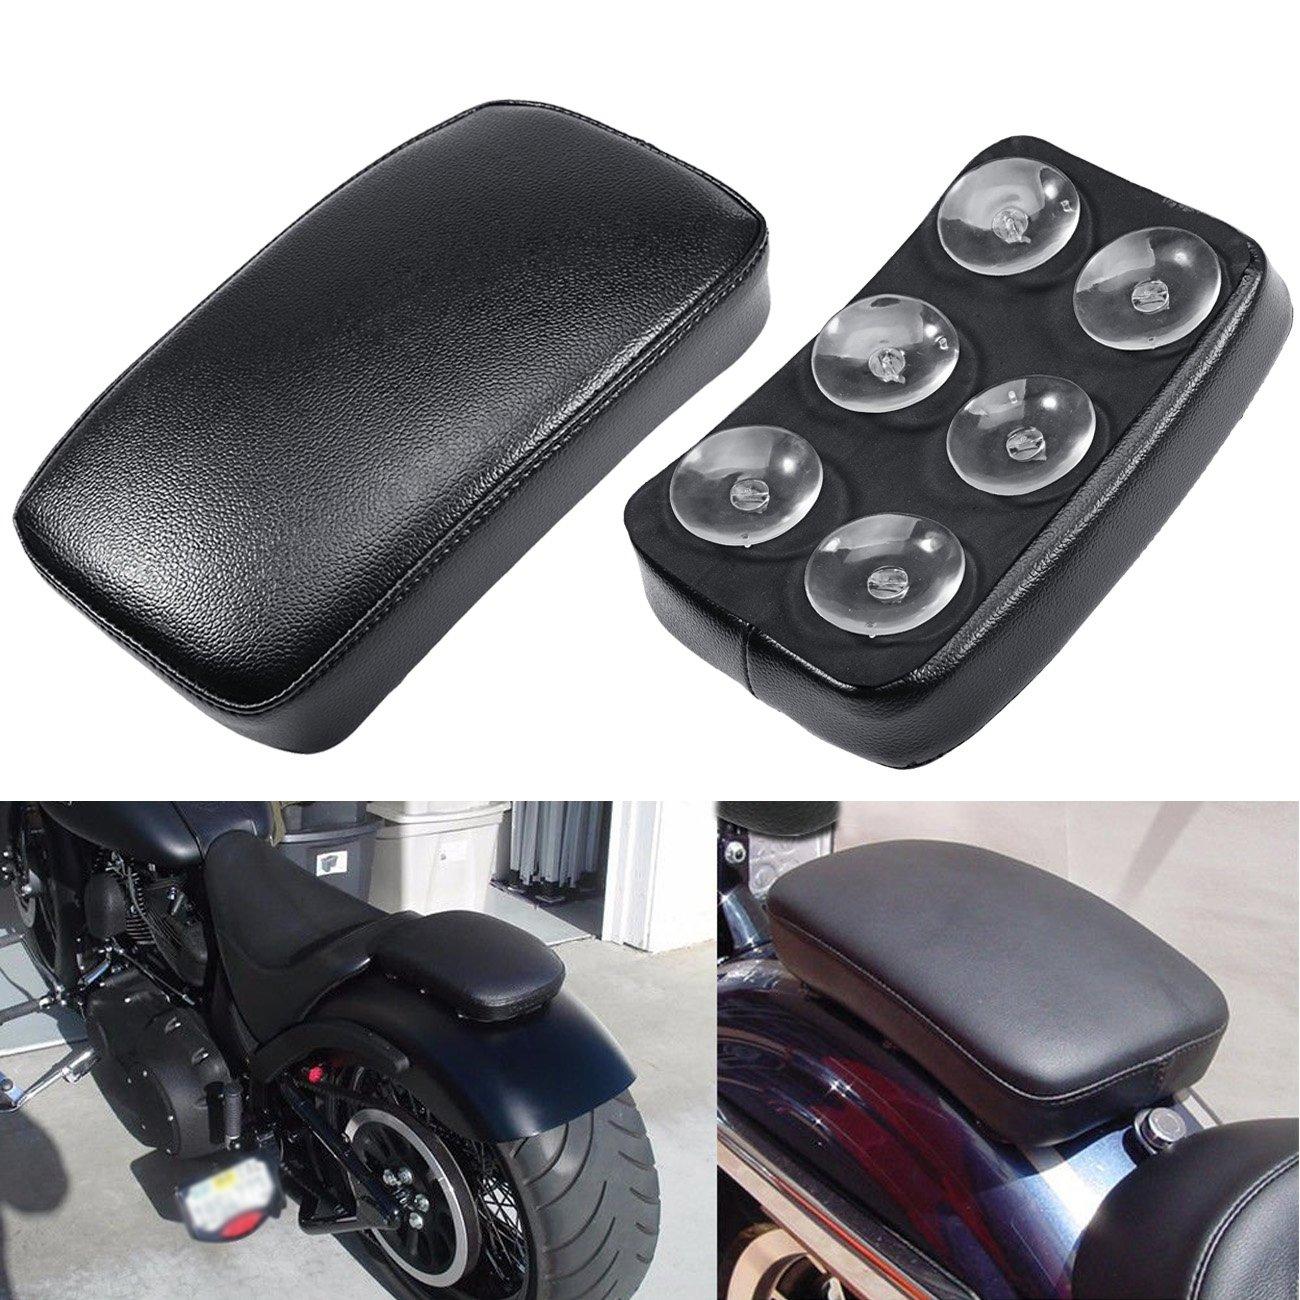 INNOGLOW Motorcycle Seat Rectangular Passenger Pad Seat 6 Suction Cup for Harley Motorcycle Cruiser Chopper Custom